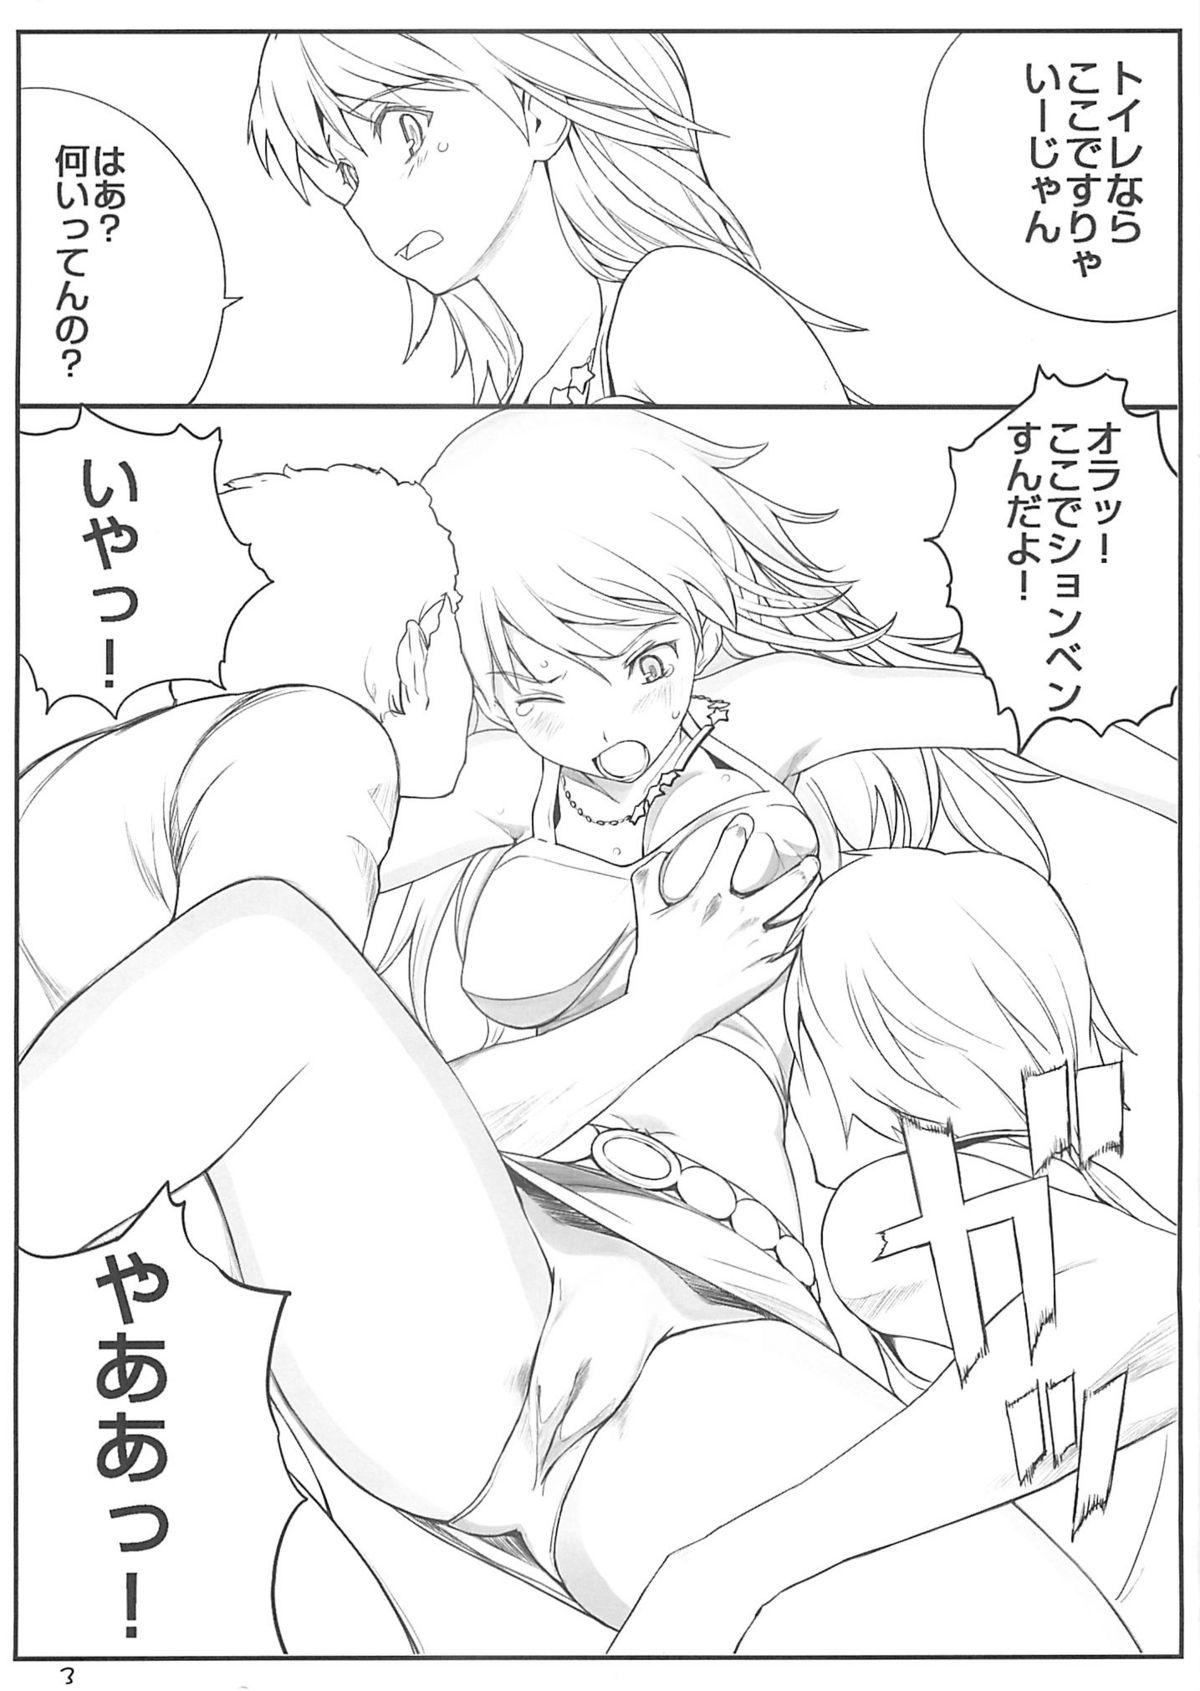 Enikki Recycle 8 no Omake Hon - Dossamagi! 2